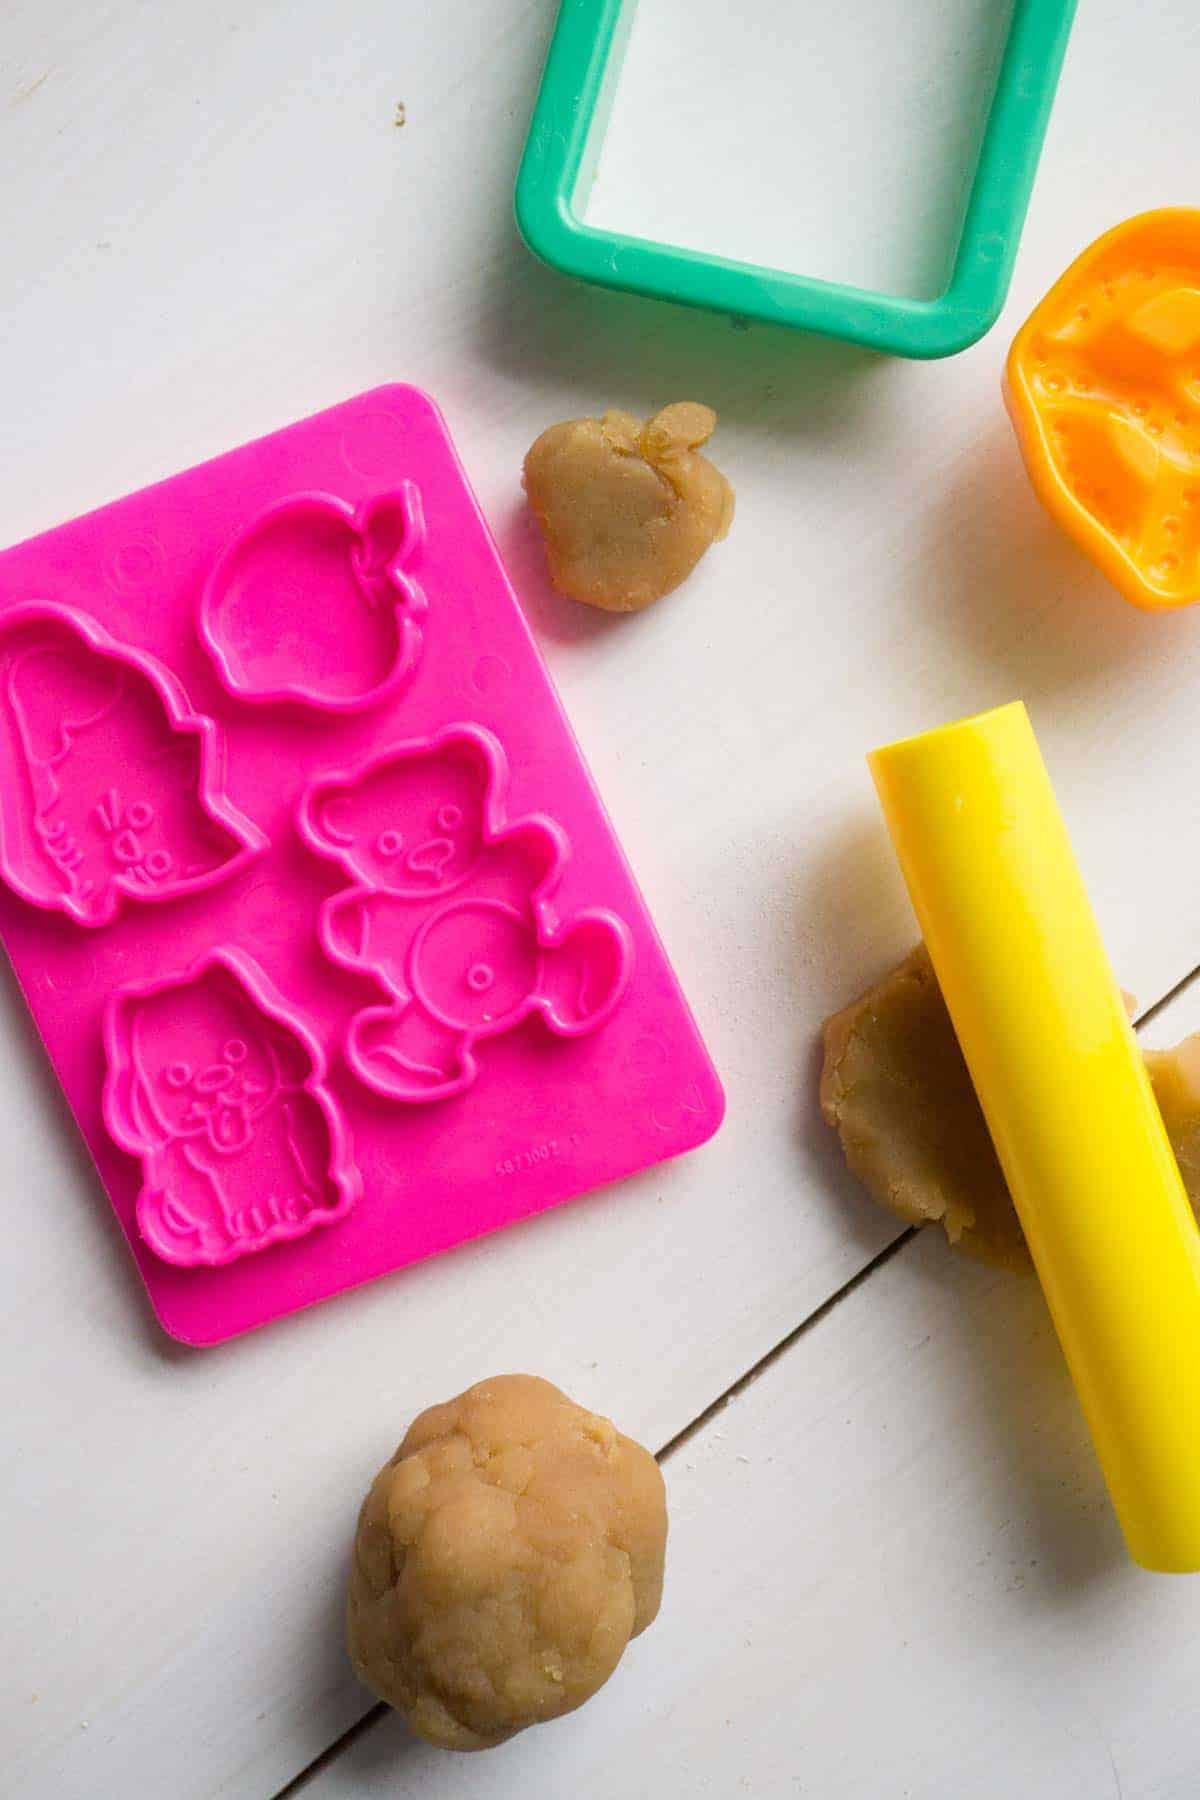 Healthy Edible Play Doh